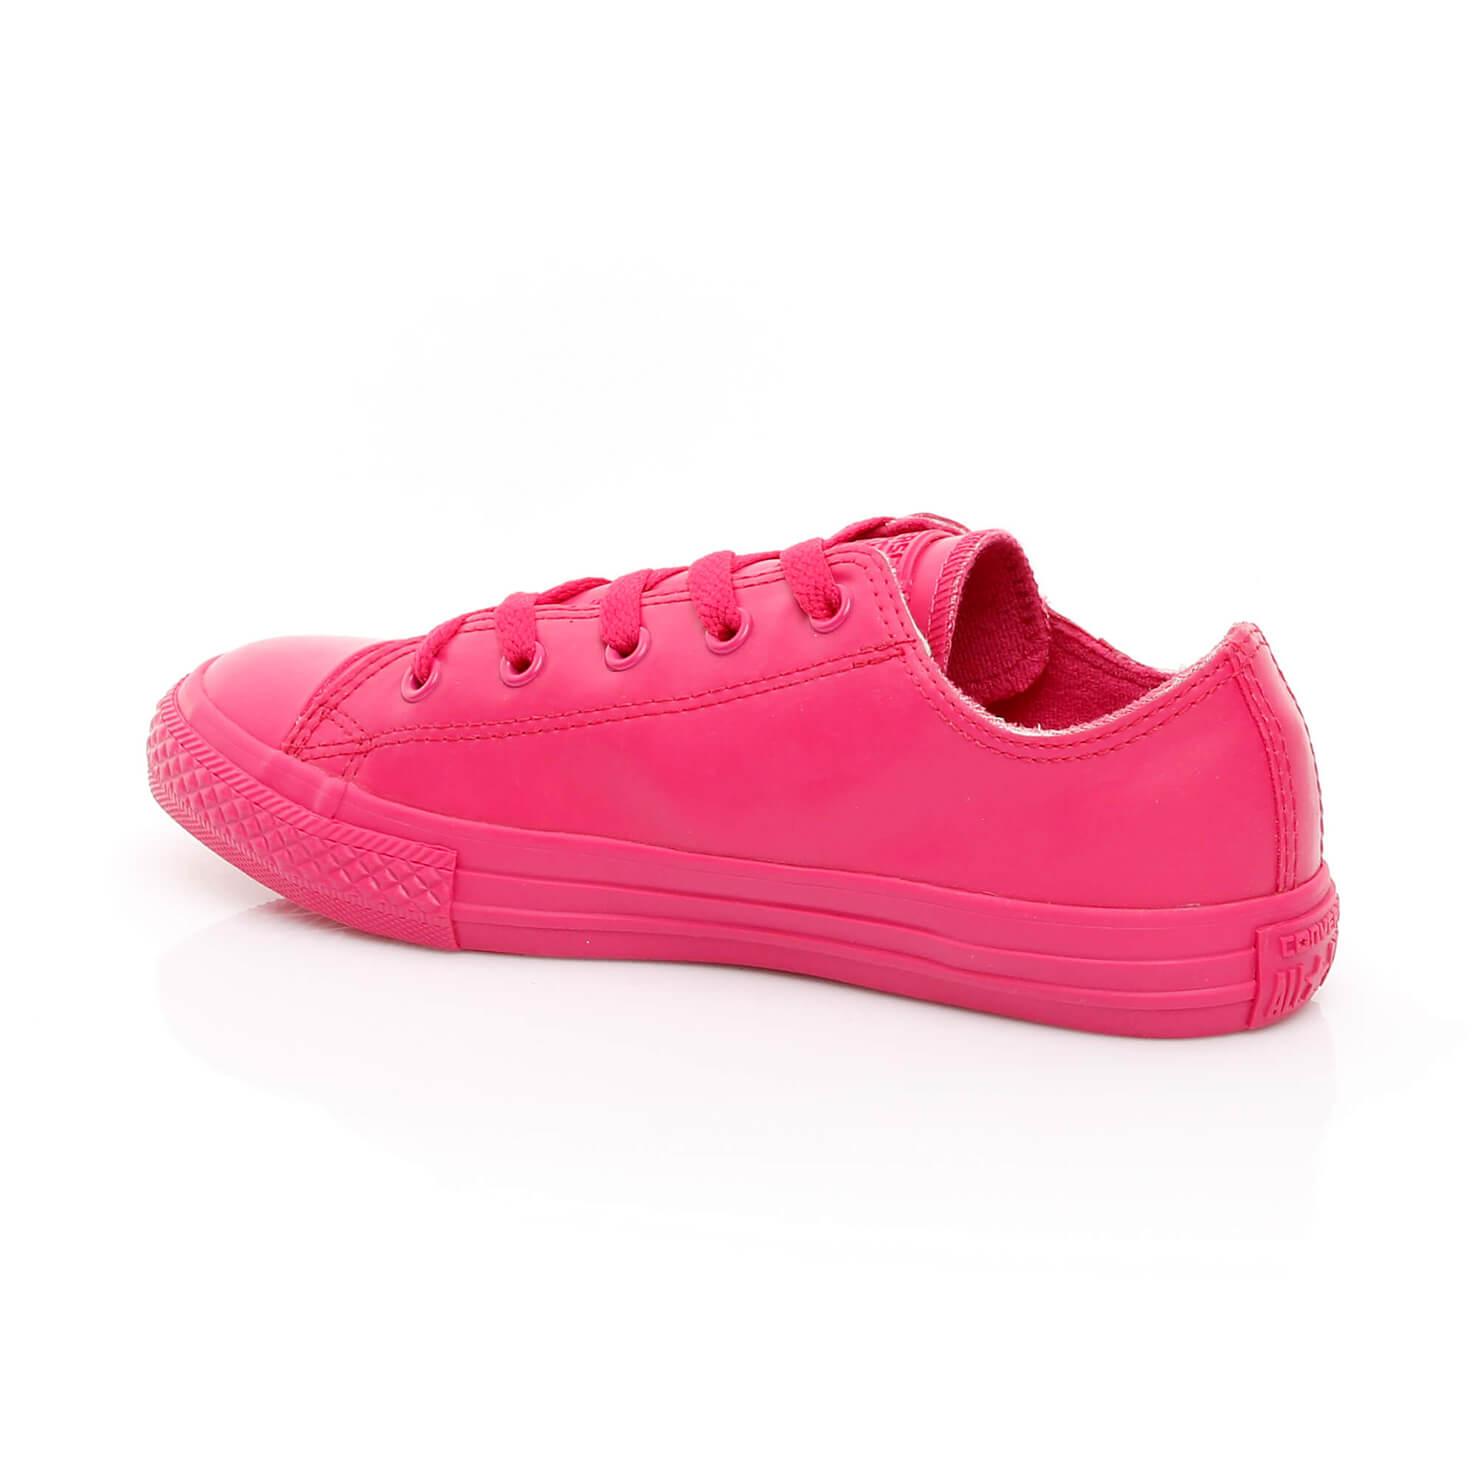 Converse Chuck Taylor All Star Çocuk Pembe Sneaker